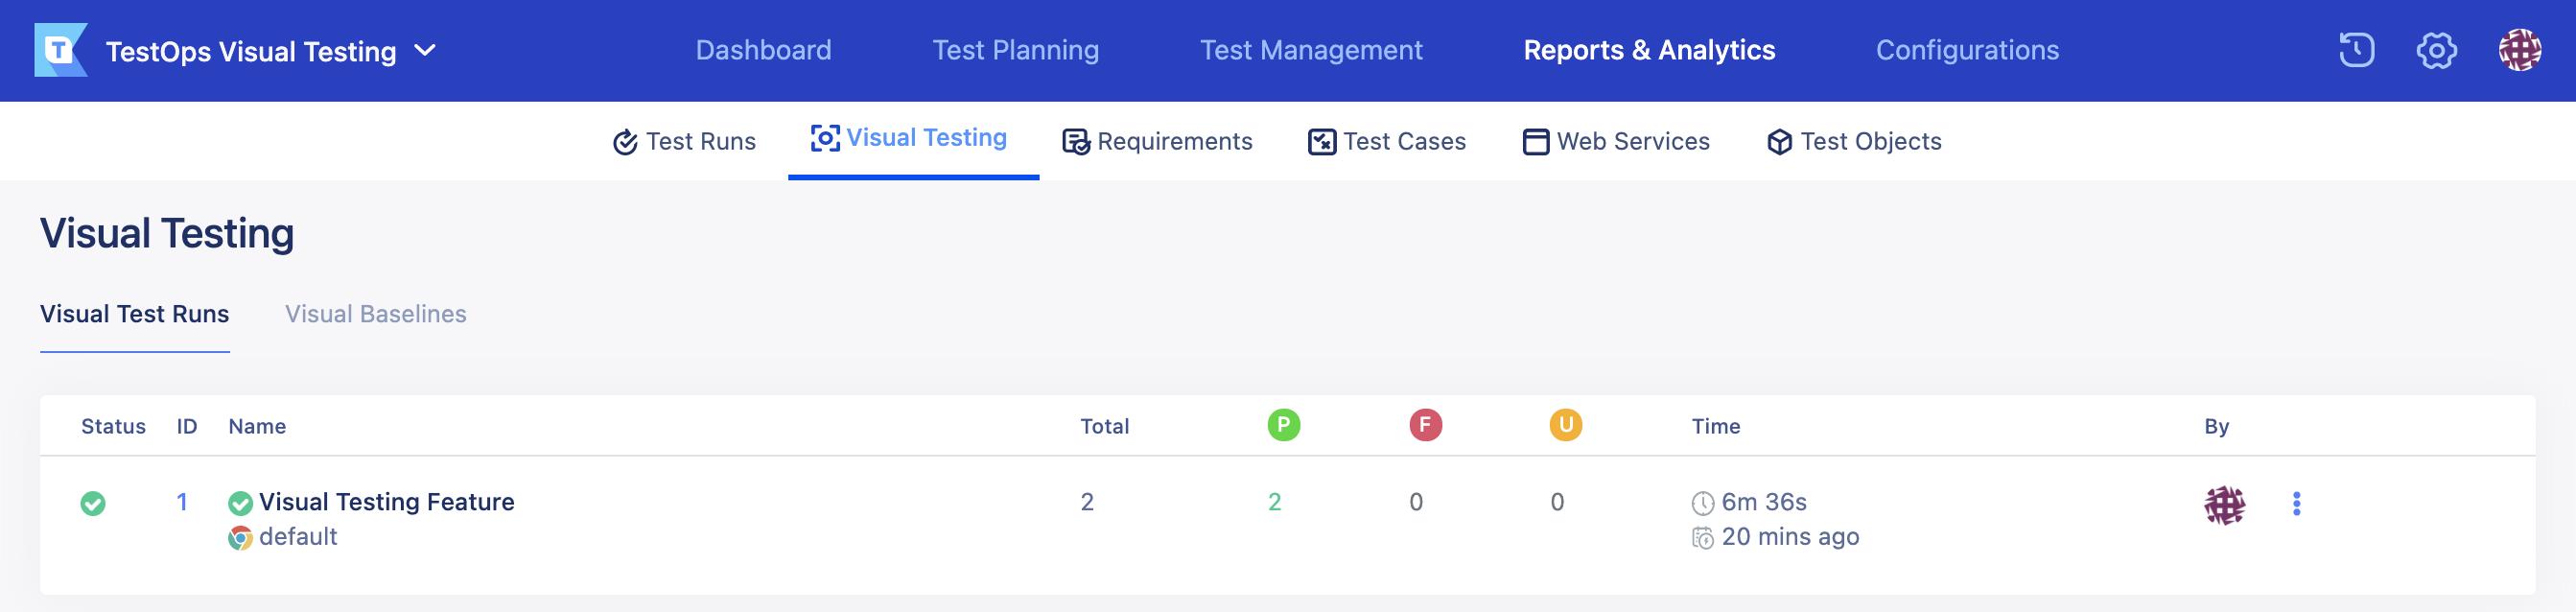 visual test runs page in visual testing